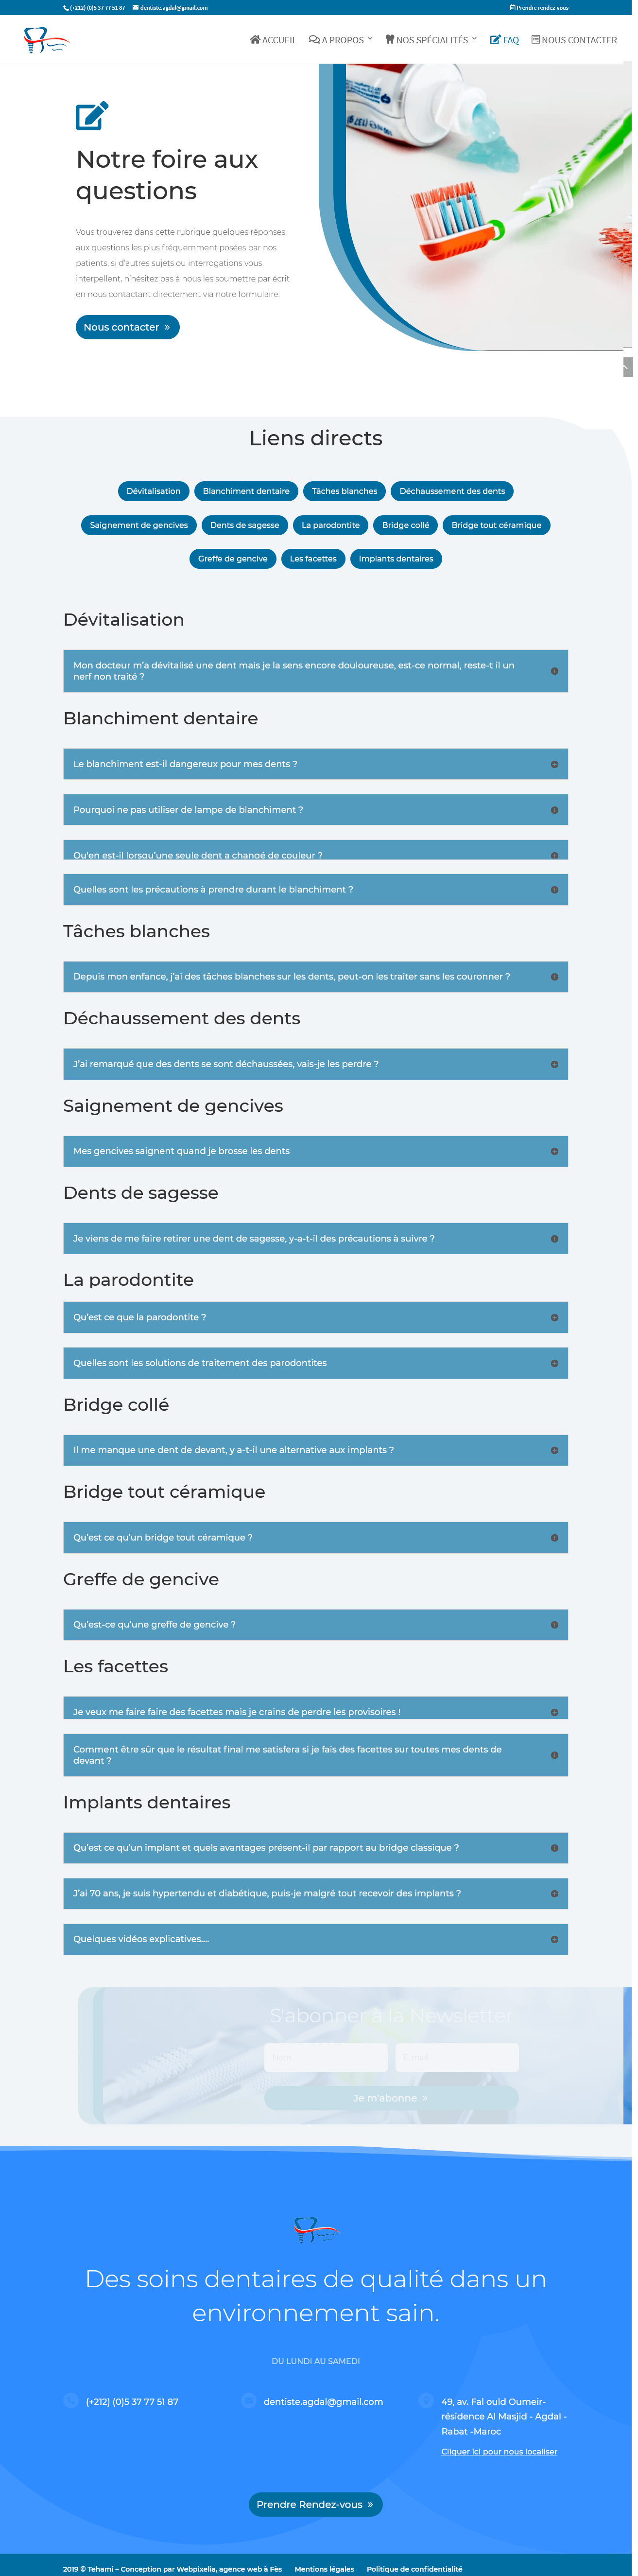 Implantrabat.com screen 6